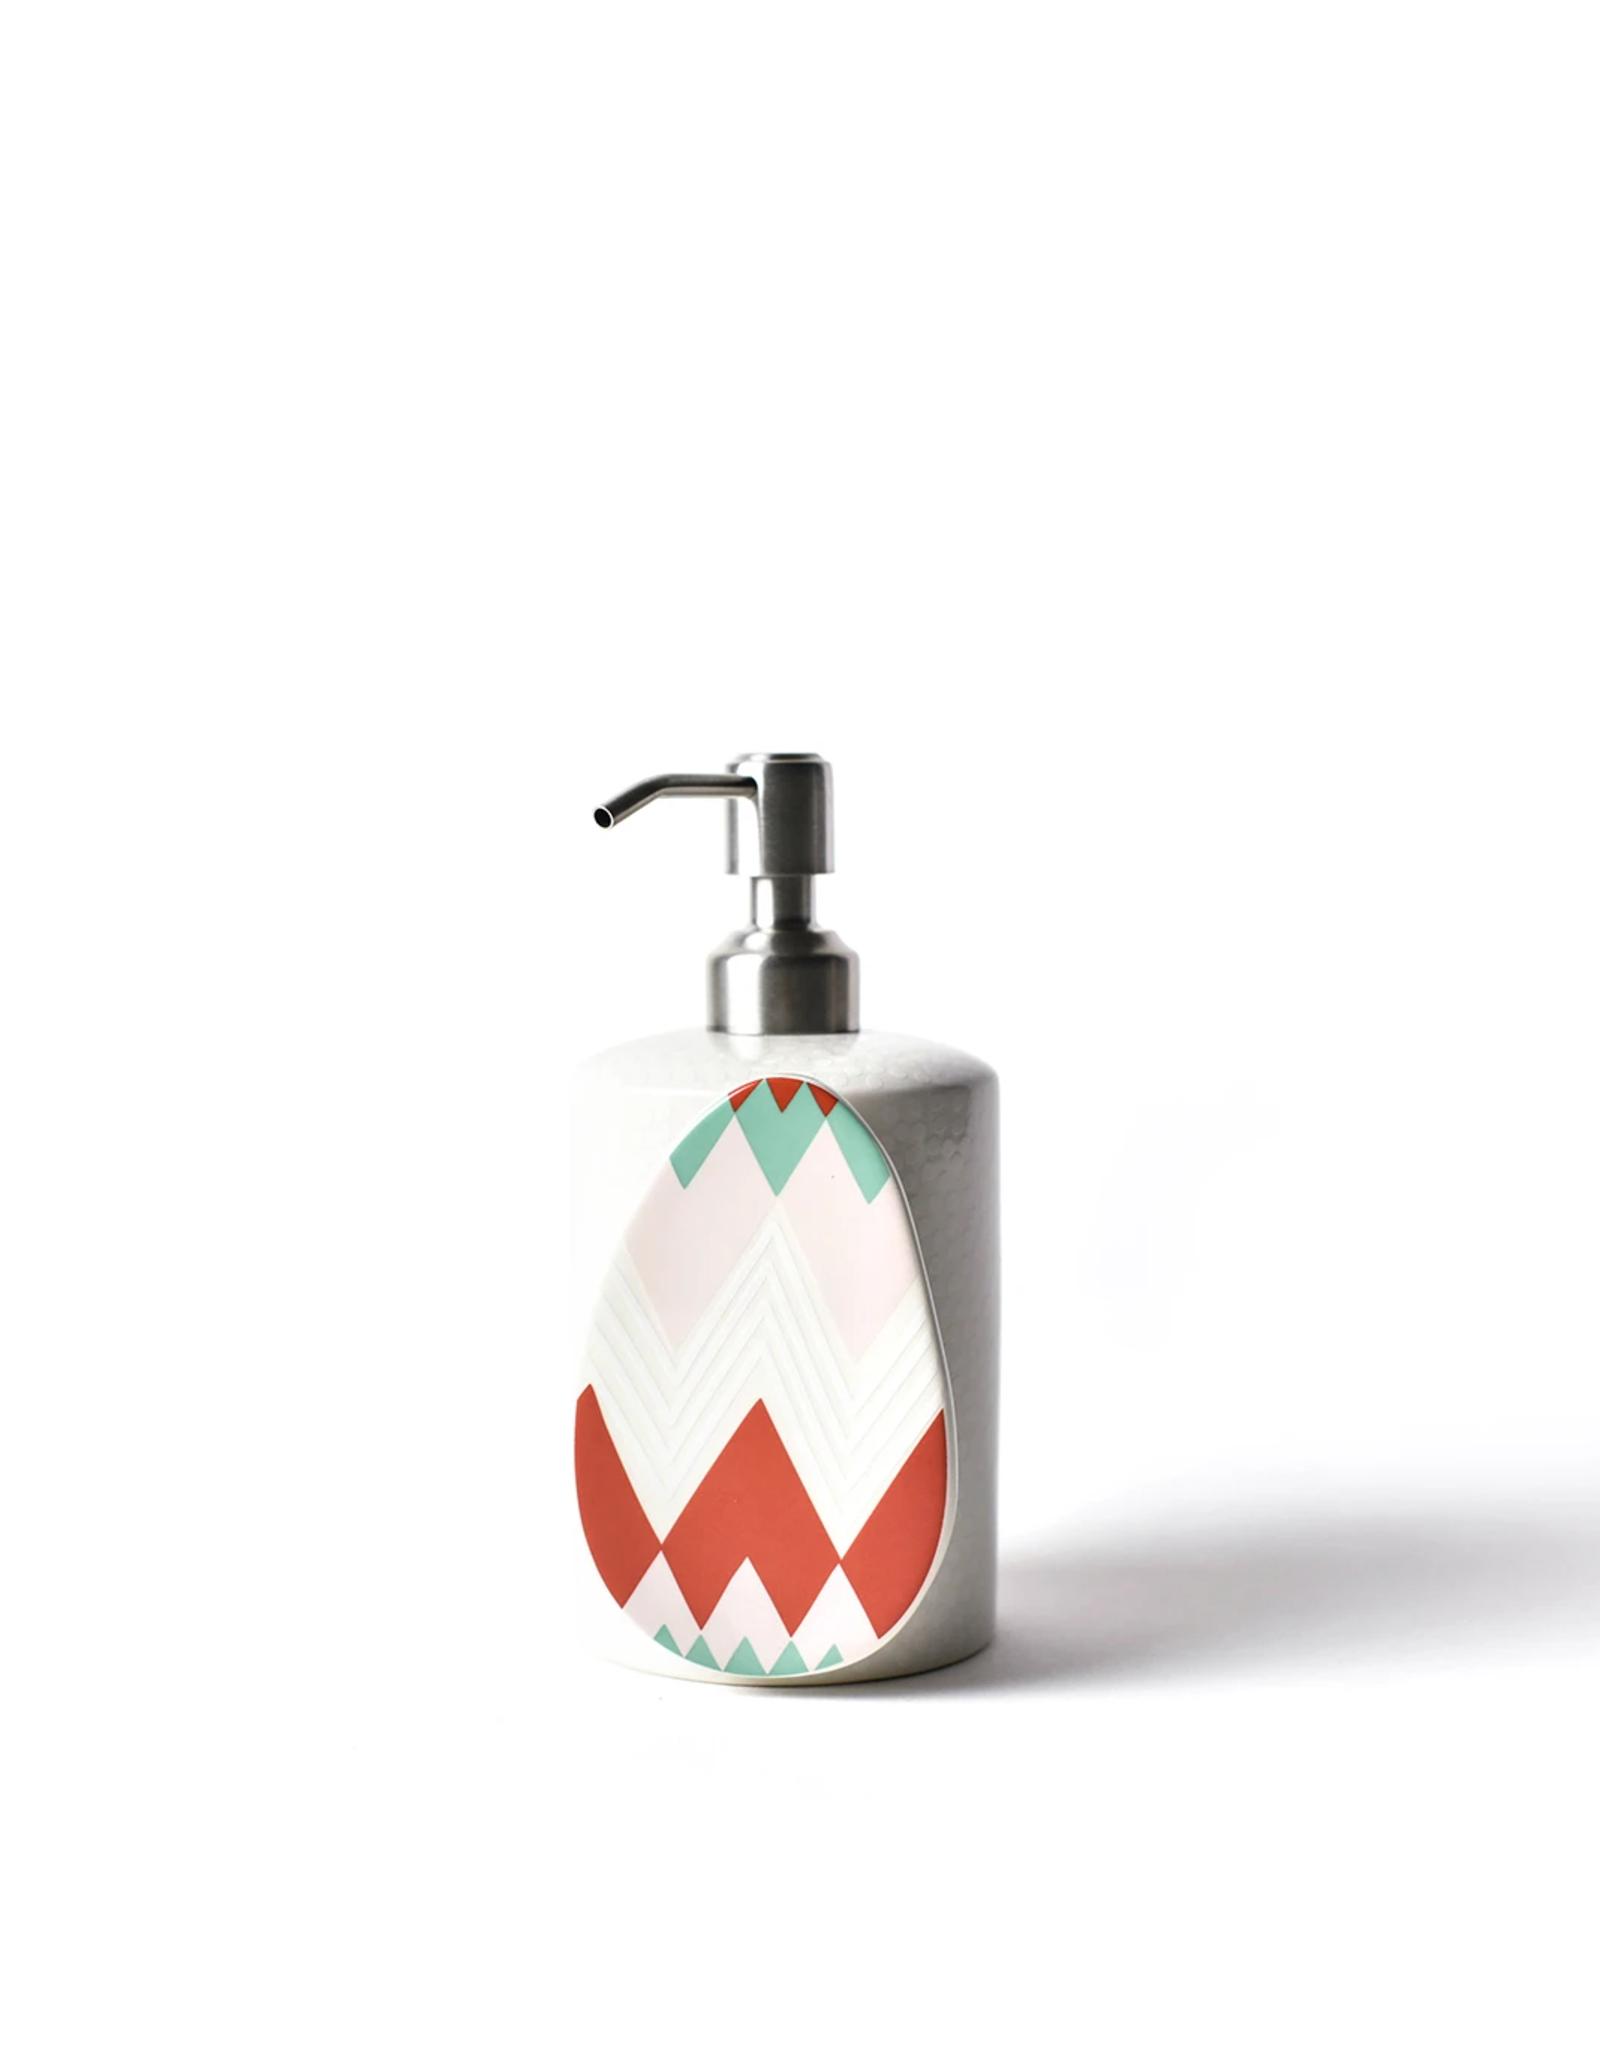 Coton Colors Cylinder Soap Pump - Small Dot